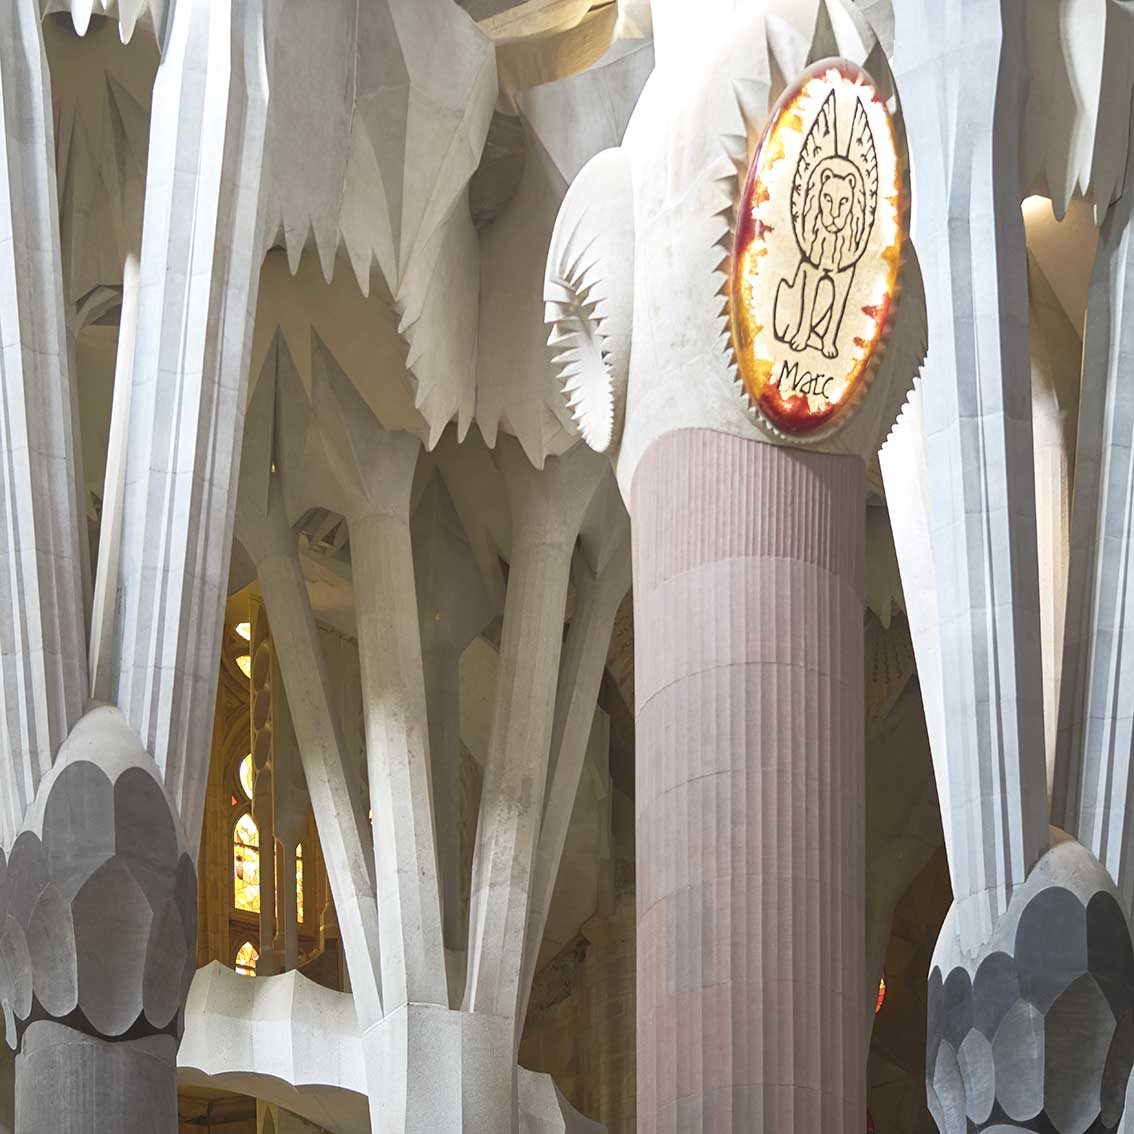 Pour-Gaudi-La-Sainte-Famille-8049-1x1